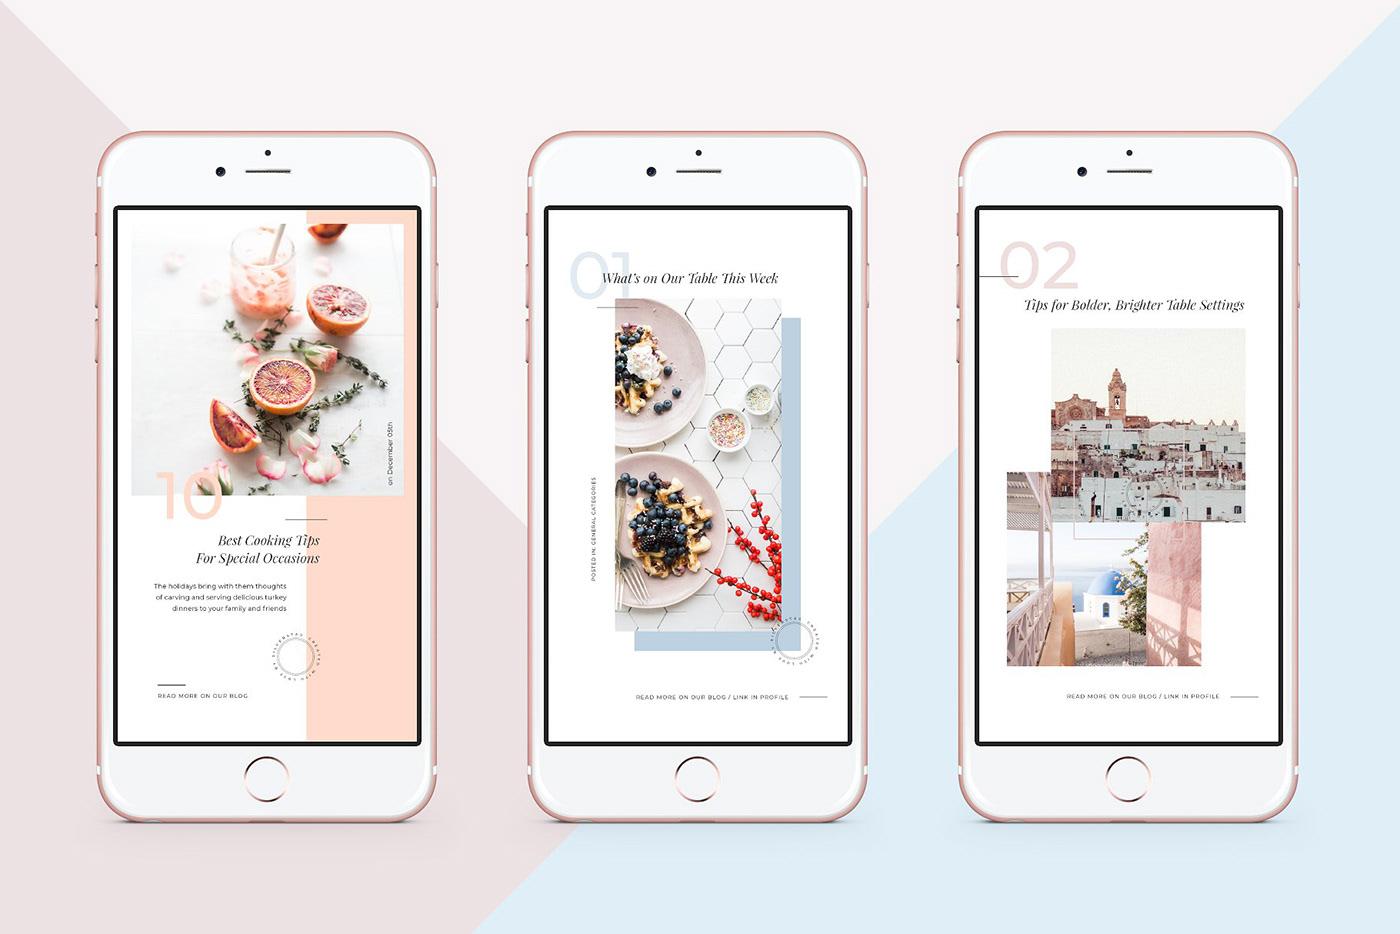 Food & Travel Instagram Stories Pack FREE DOWNLOAD! on Behance